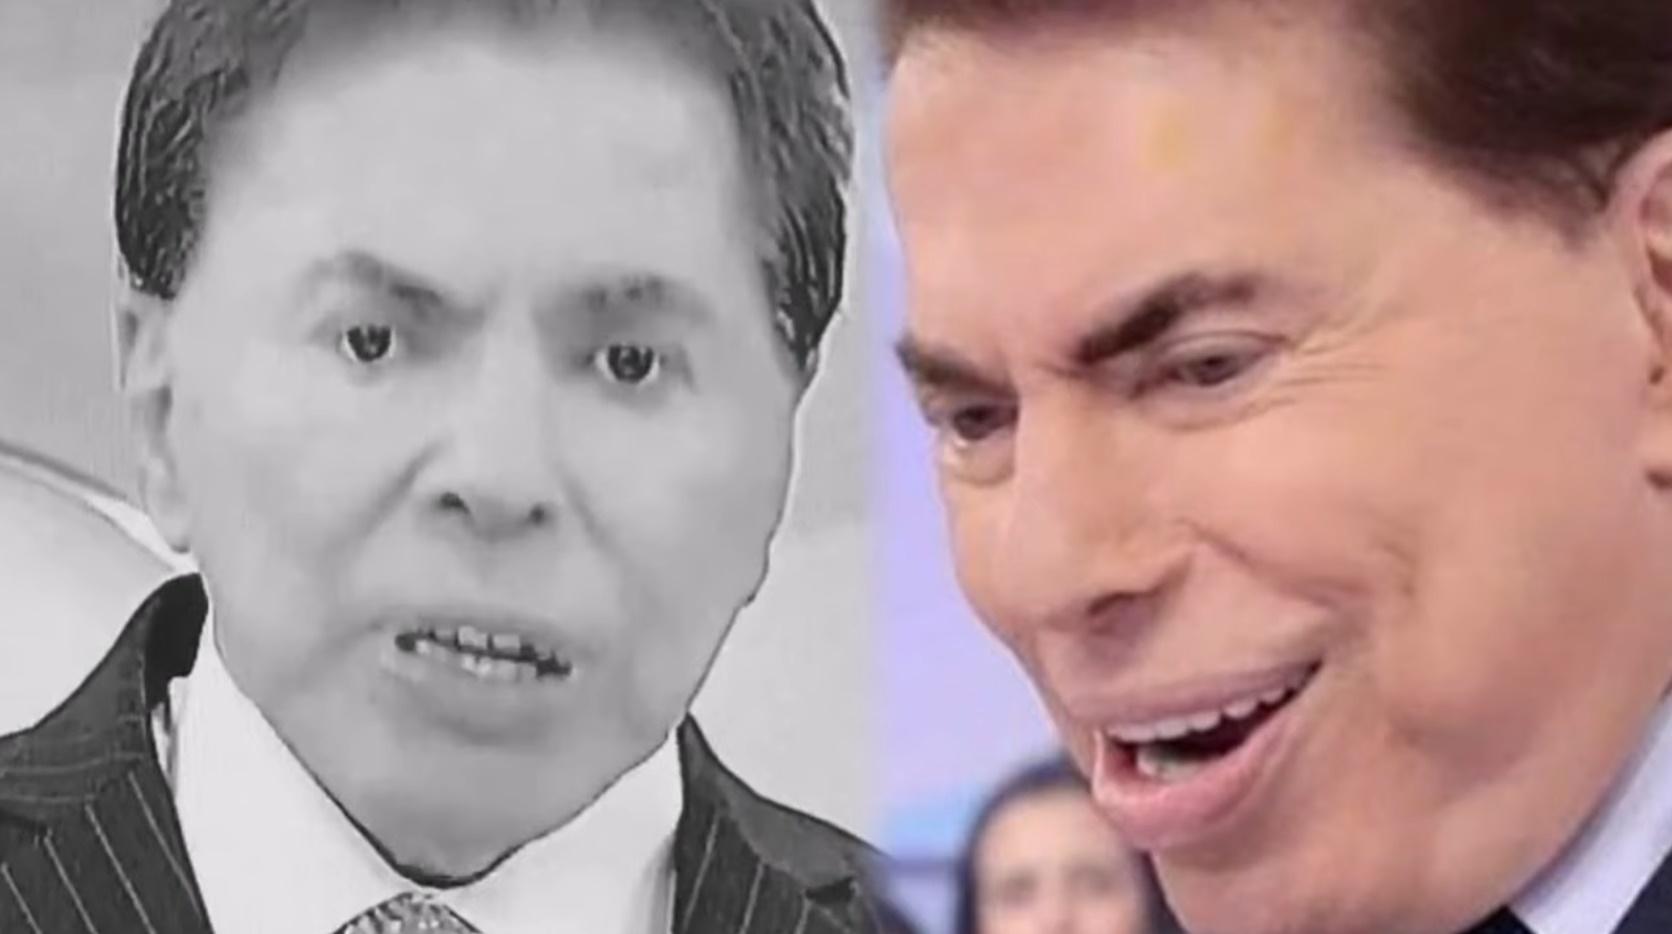 "URGENTE: Acaba de chegar a pior notícia sobre Silvio Santos aos 90 anos e abala todos nós ""Descanse"""